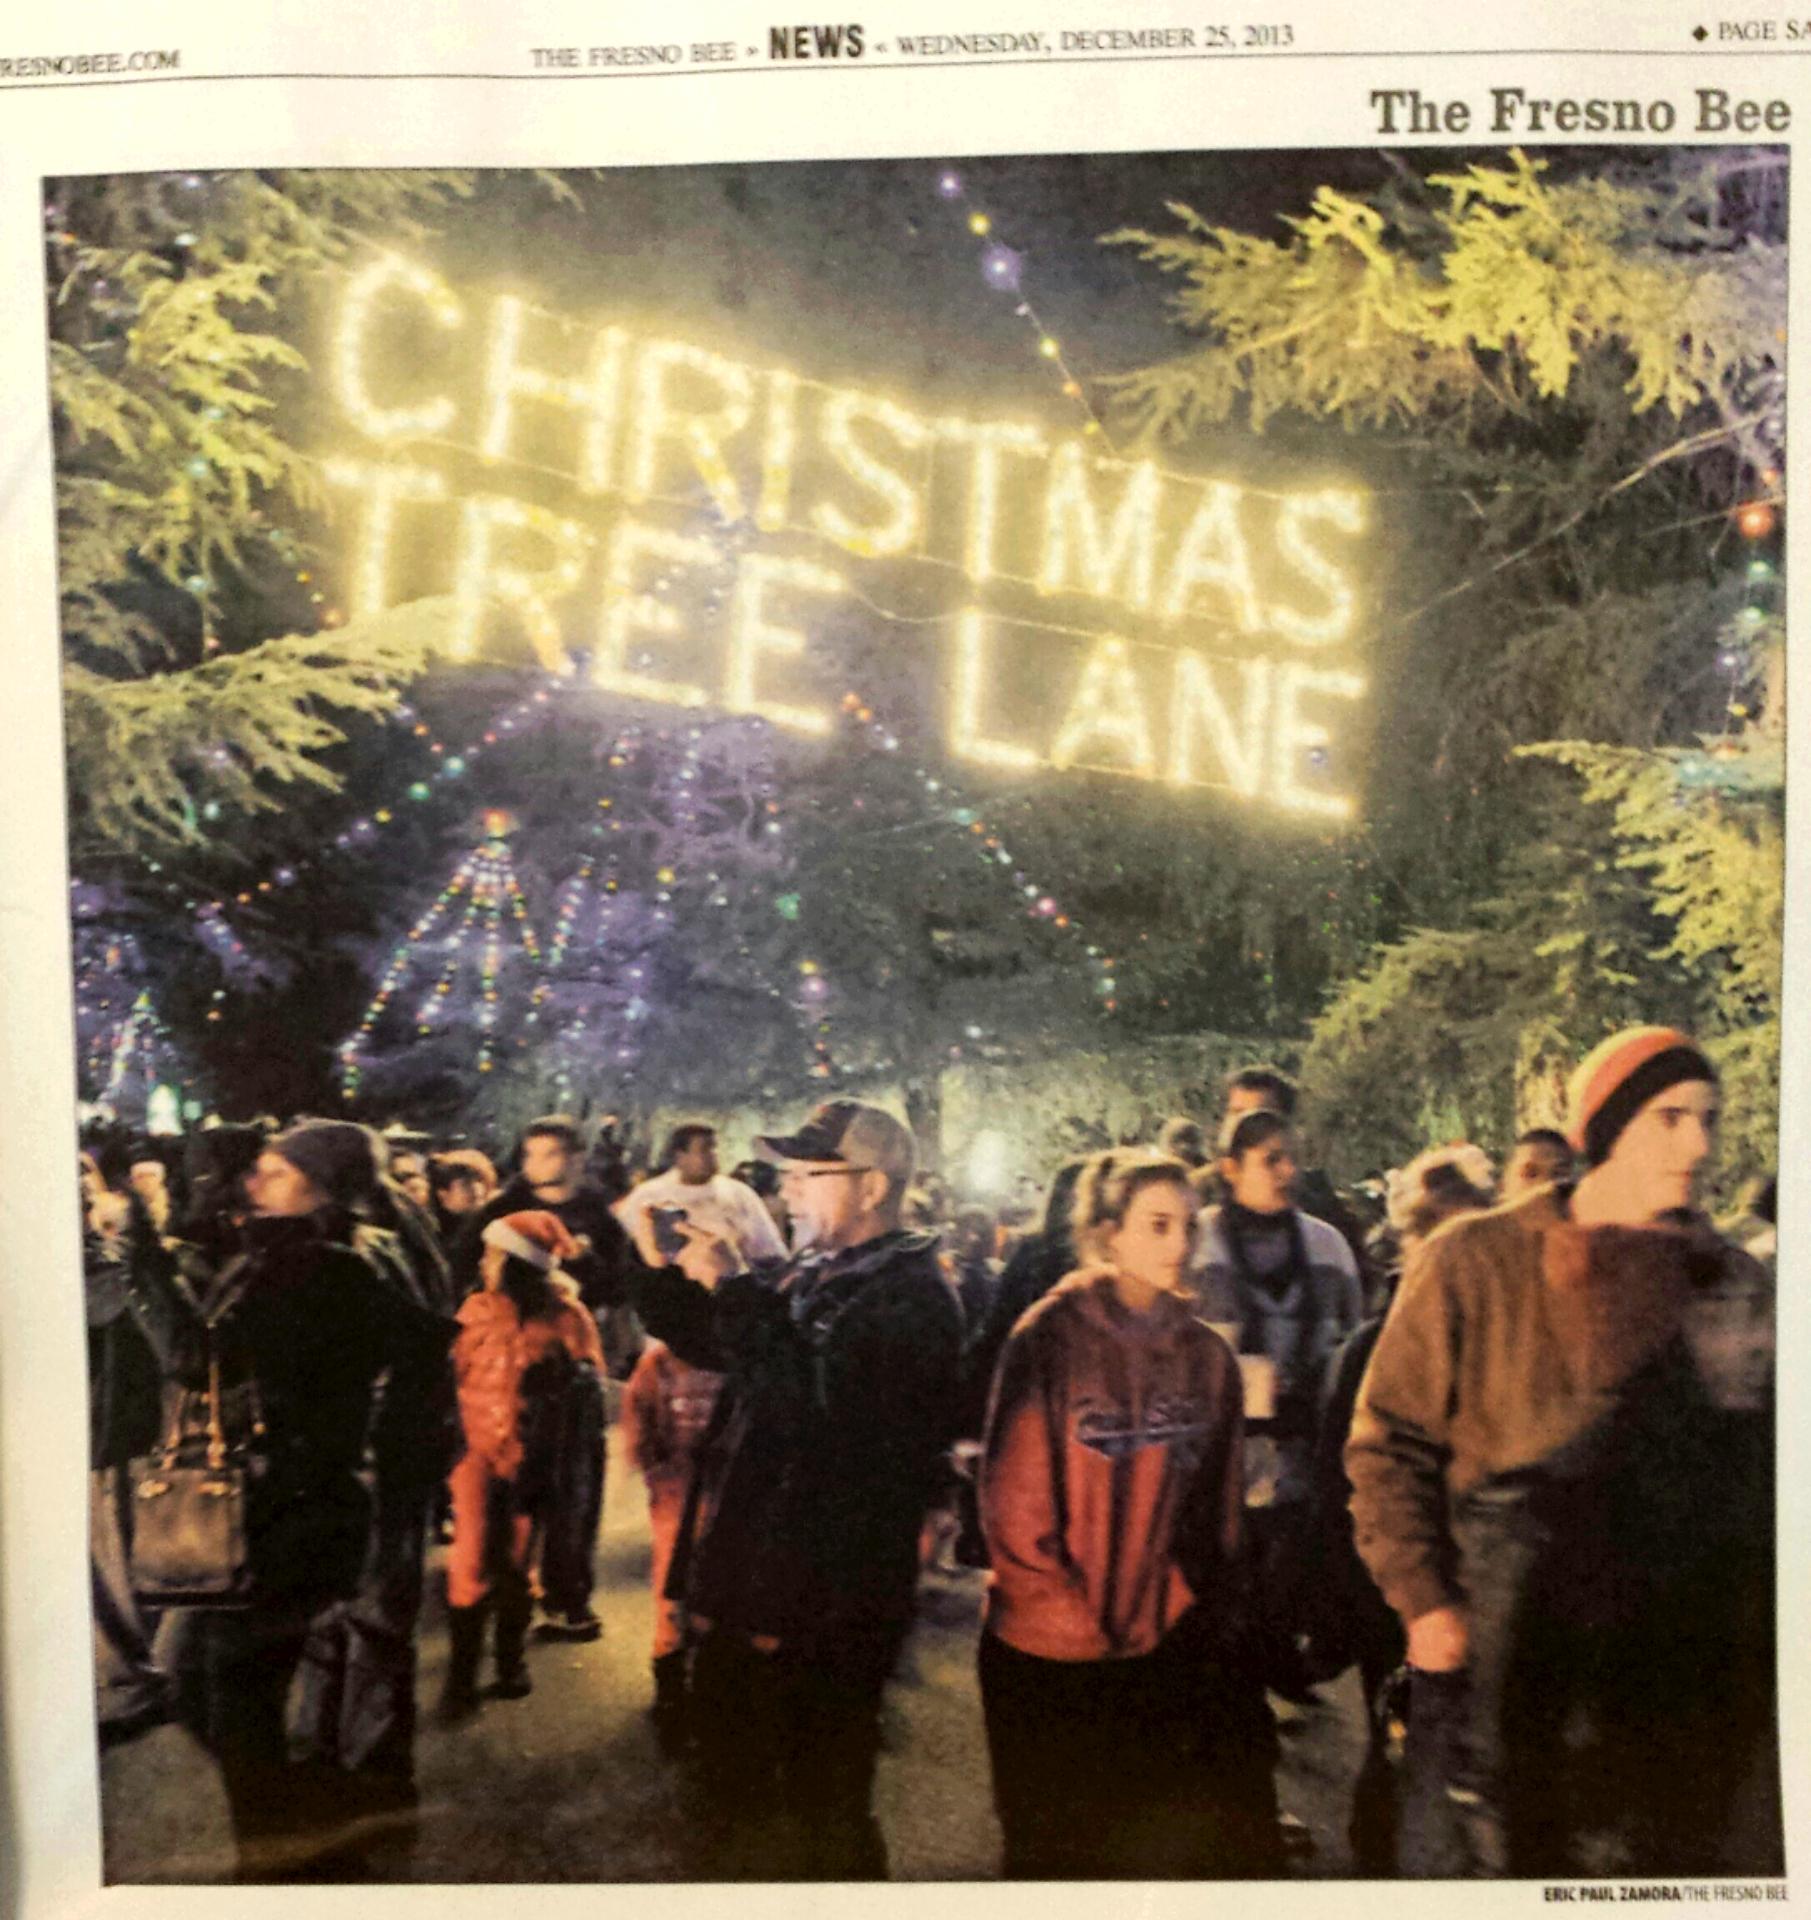 Christmas Tree Lane, Fresno, Ca. Van Ness Ave. 1912